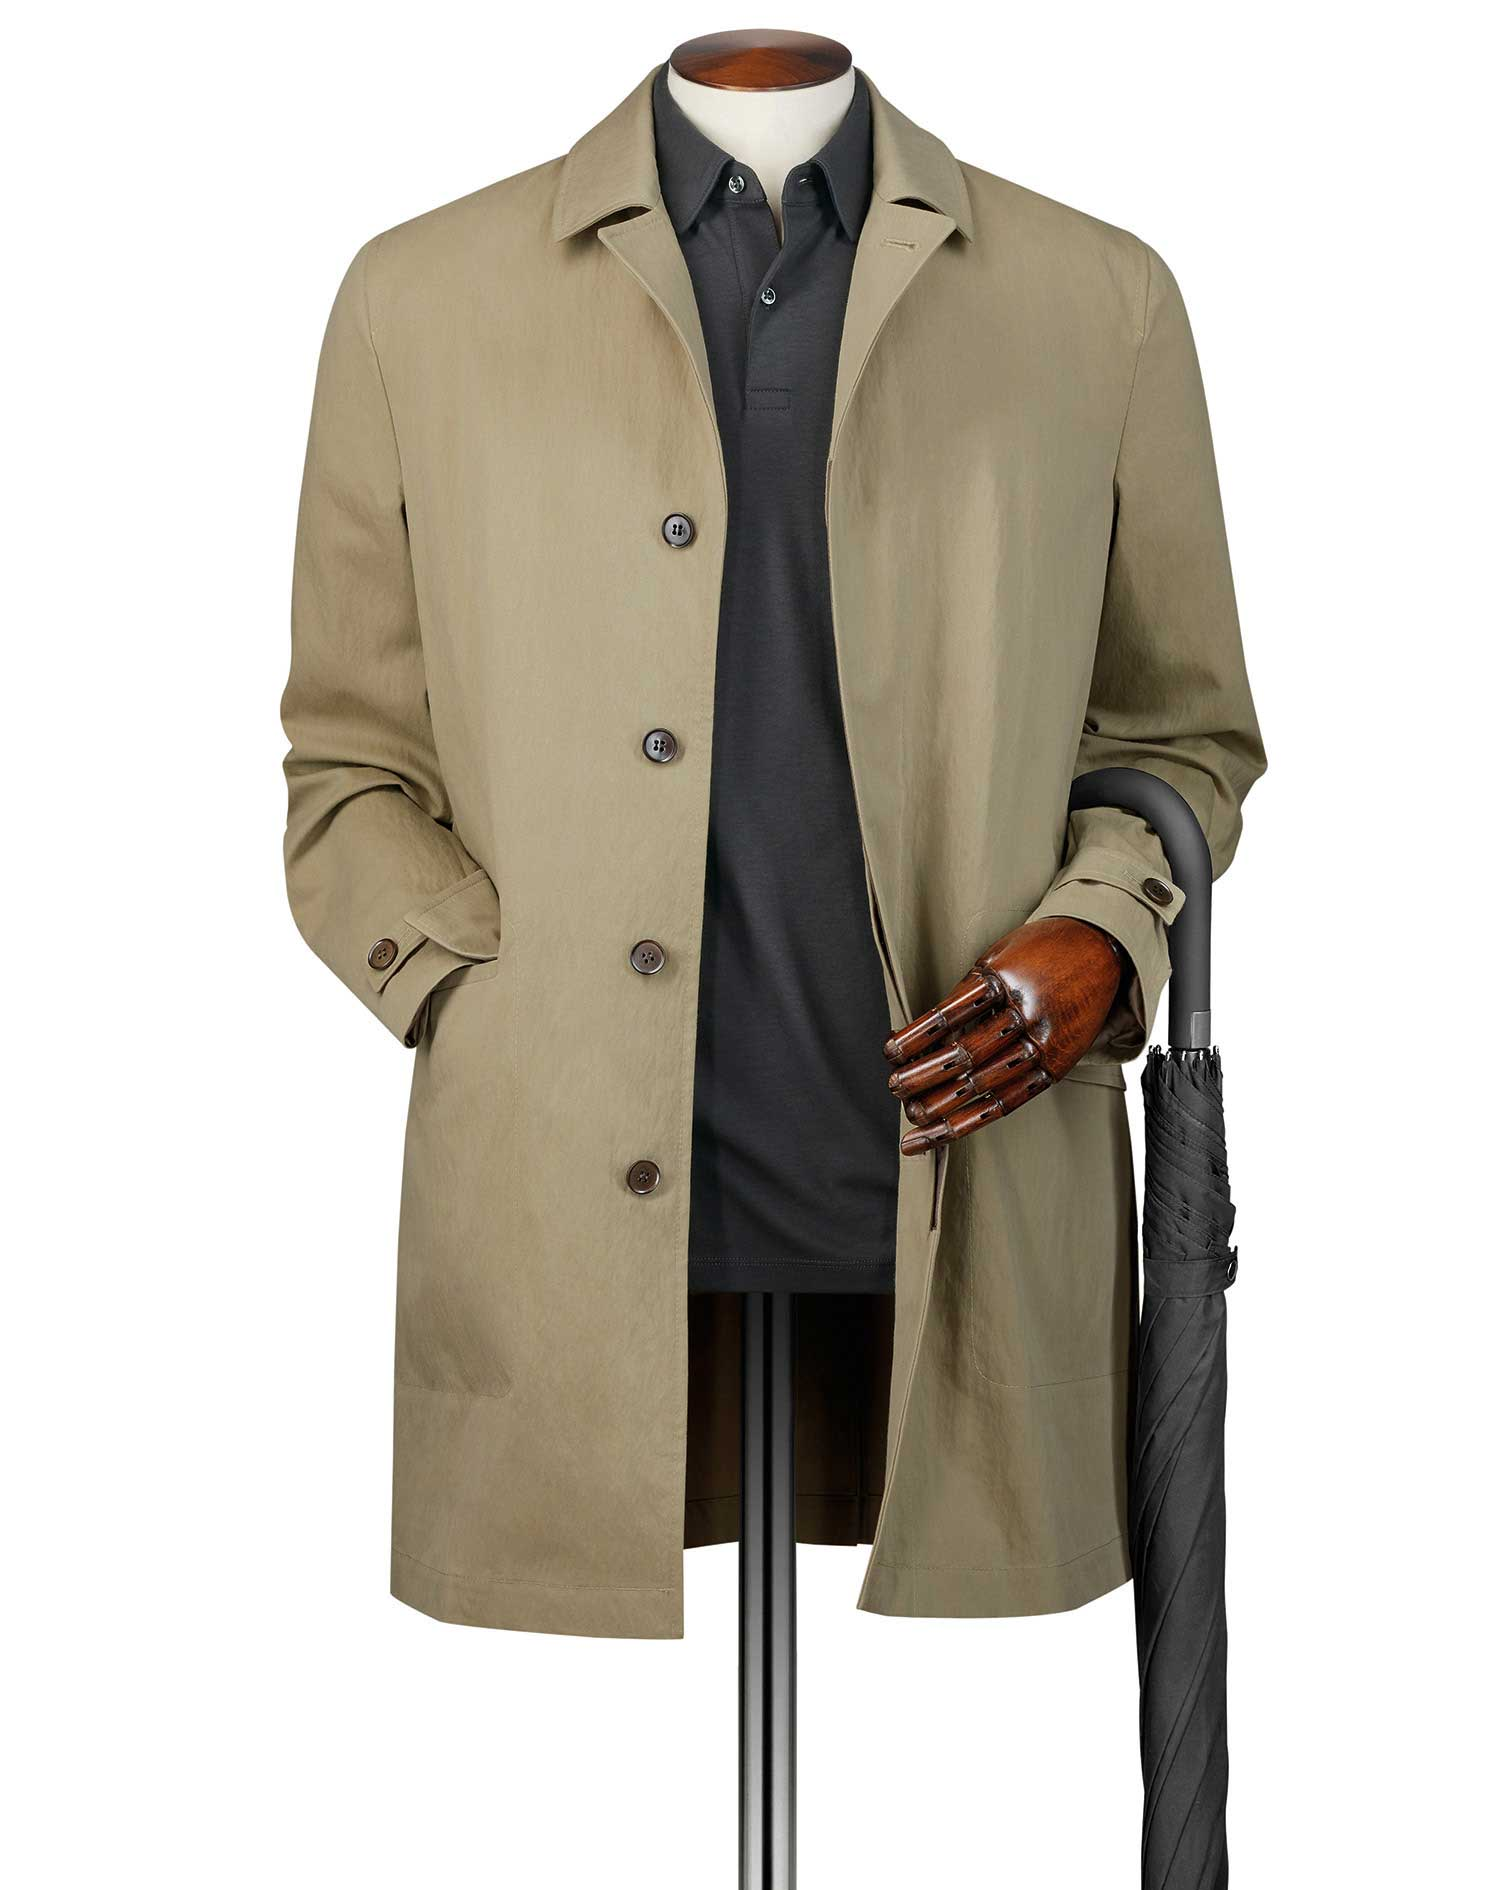 Stone Italian Cotton RainCotton coat Size 42 Regular by Charles Tyrwhitt